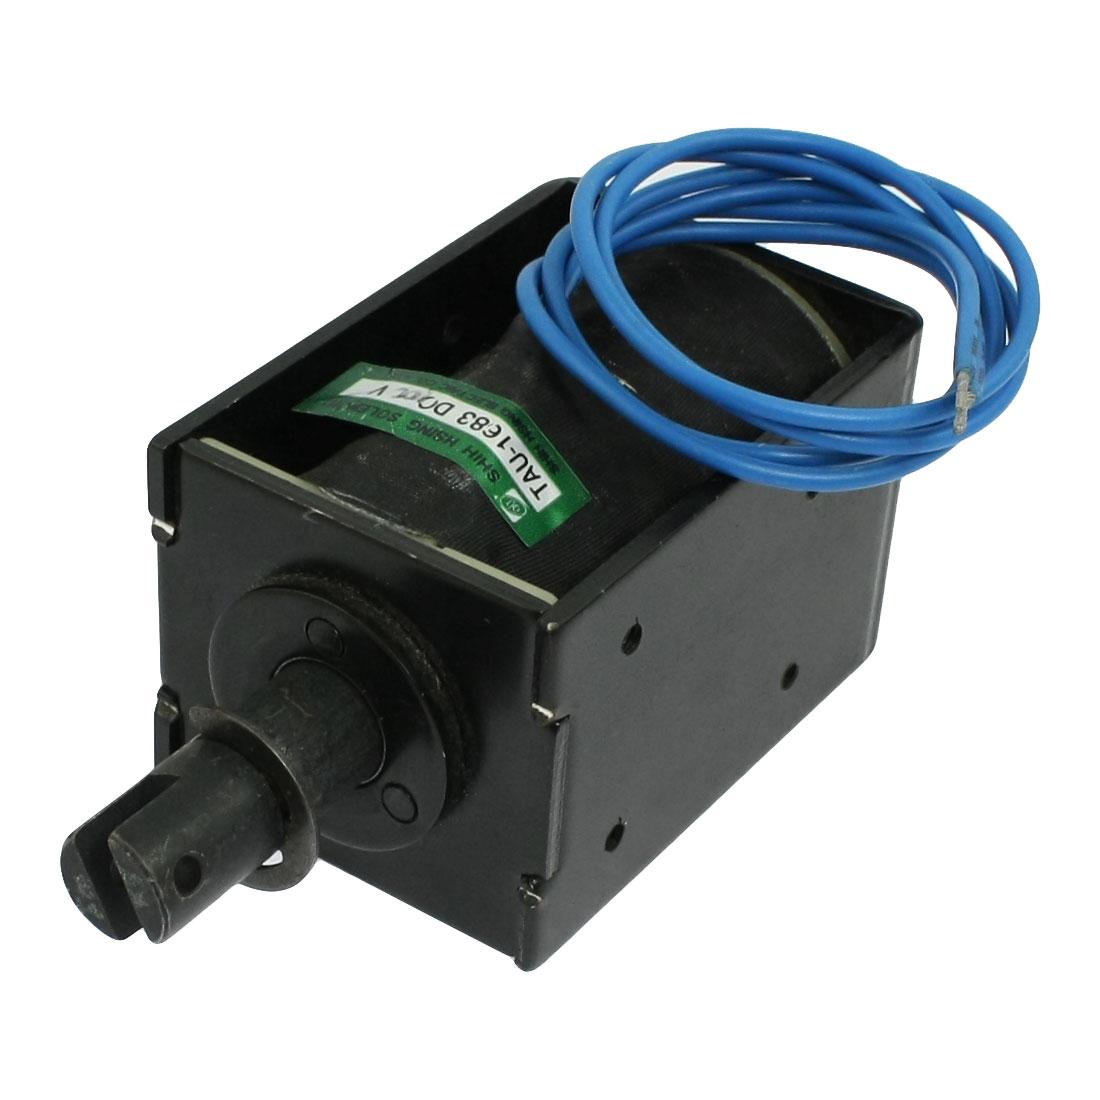 110V 1.54A Open Frame Pull Type Linear Solenoid 20mm Stroke 1.6N